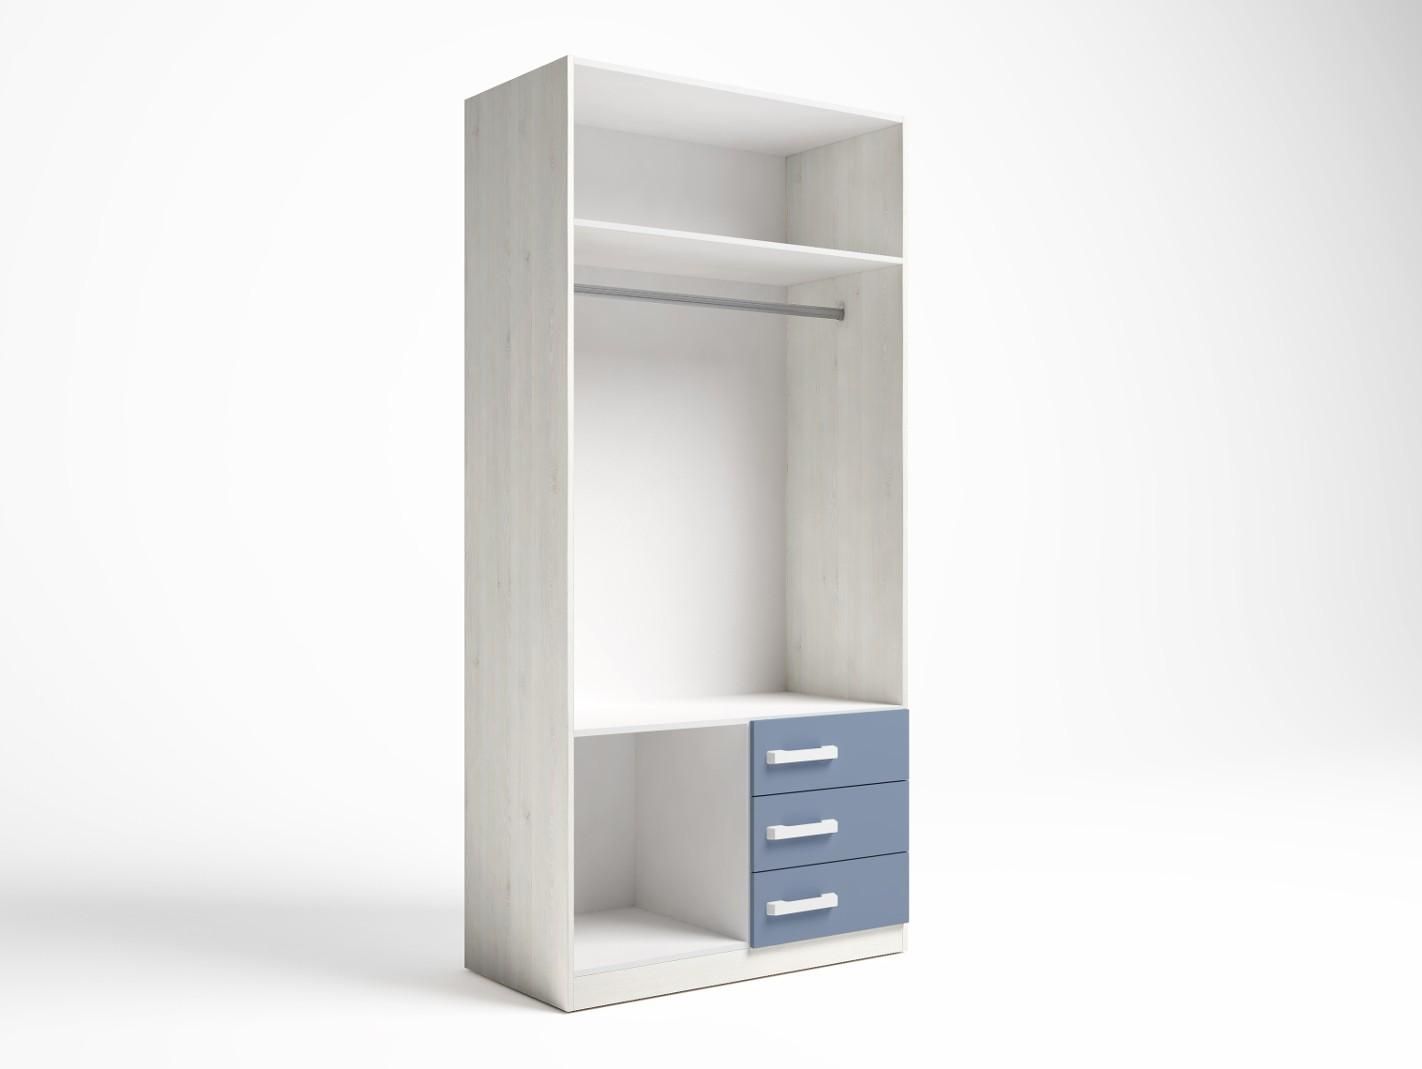 Sofas cama valladolid 43831 muebles ideas - Merkamueble outlet ...